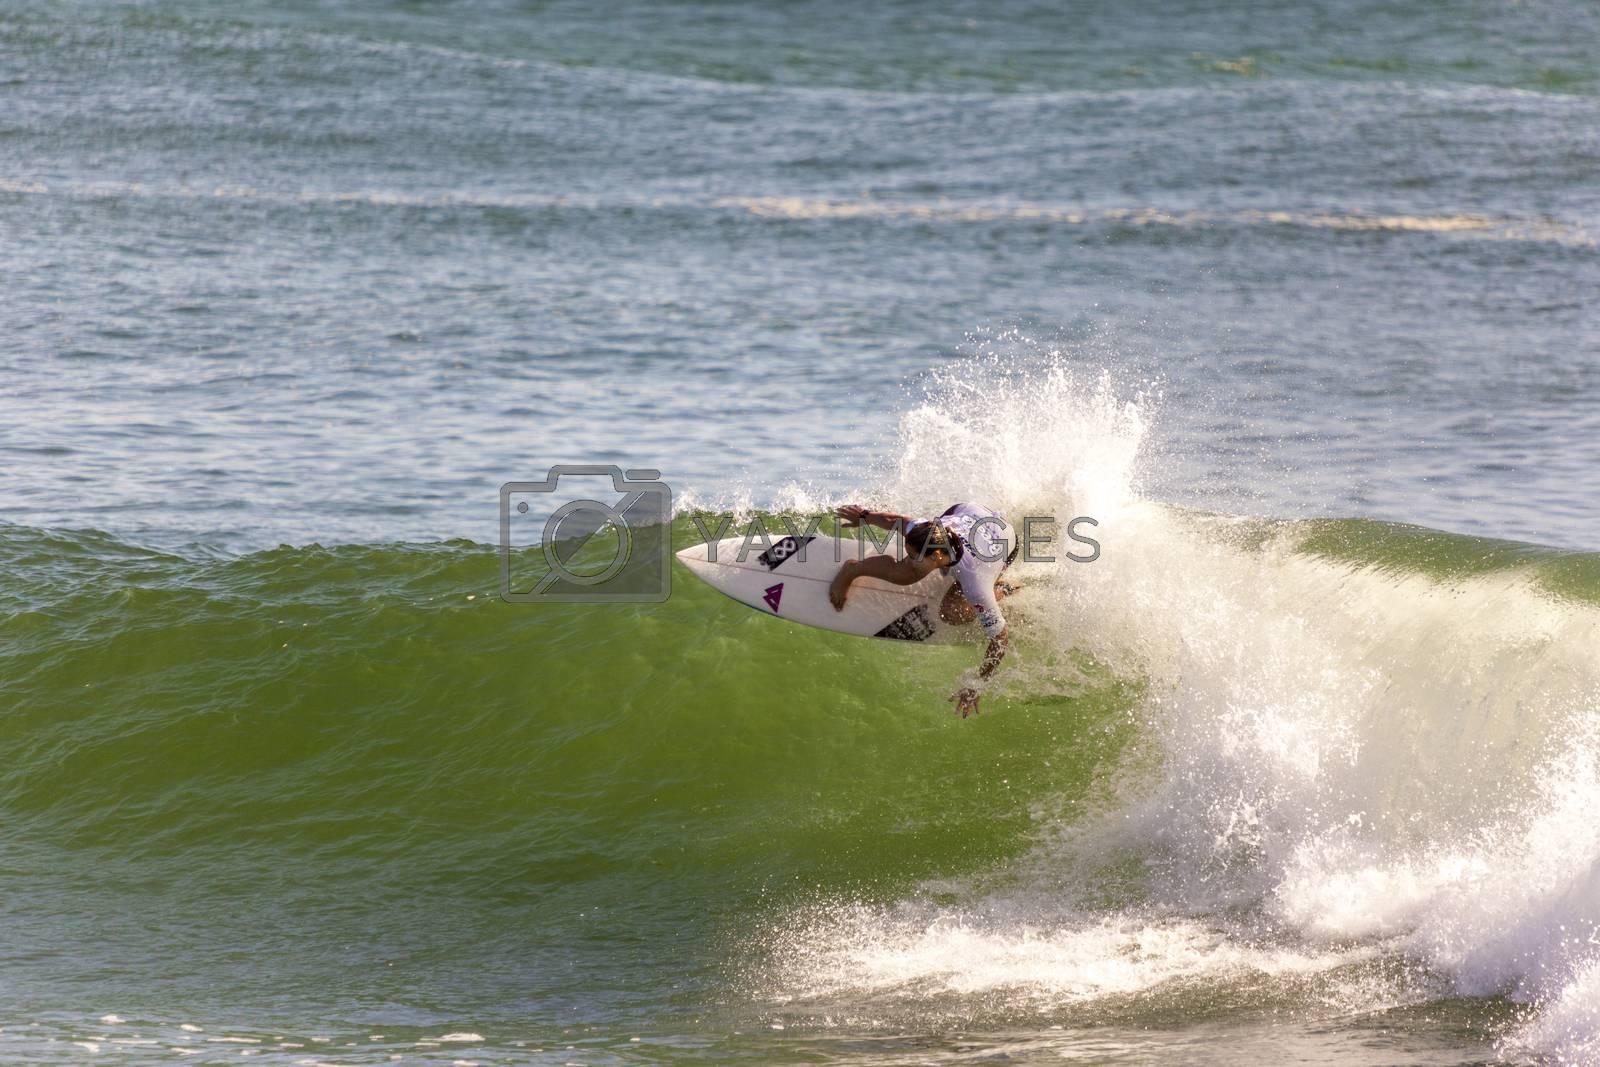 BREAKA BURLEIGH PRO 2013 , GOLD COAST, AUSTRALIA - FEB 3: Unidentified professional female surfer compete on the Burleigh Pro 2013 event, February 3, 2013, Burleigh , Gold Coast, Australia